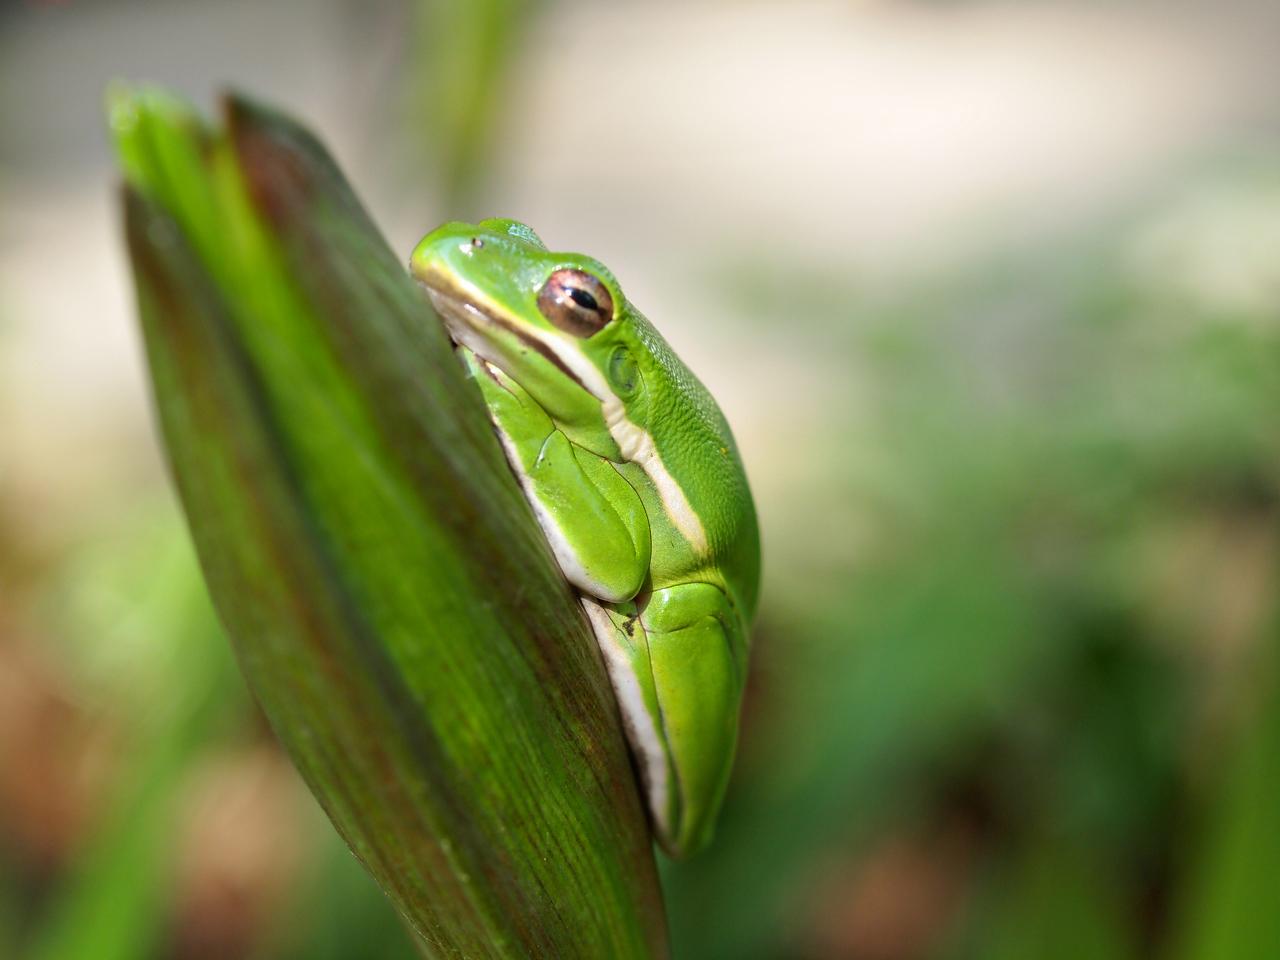 Green Tree Frog - Macro